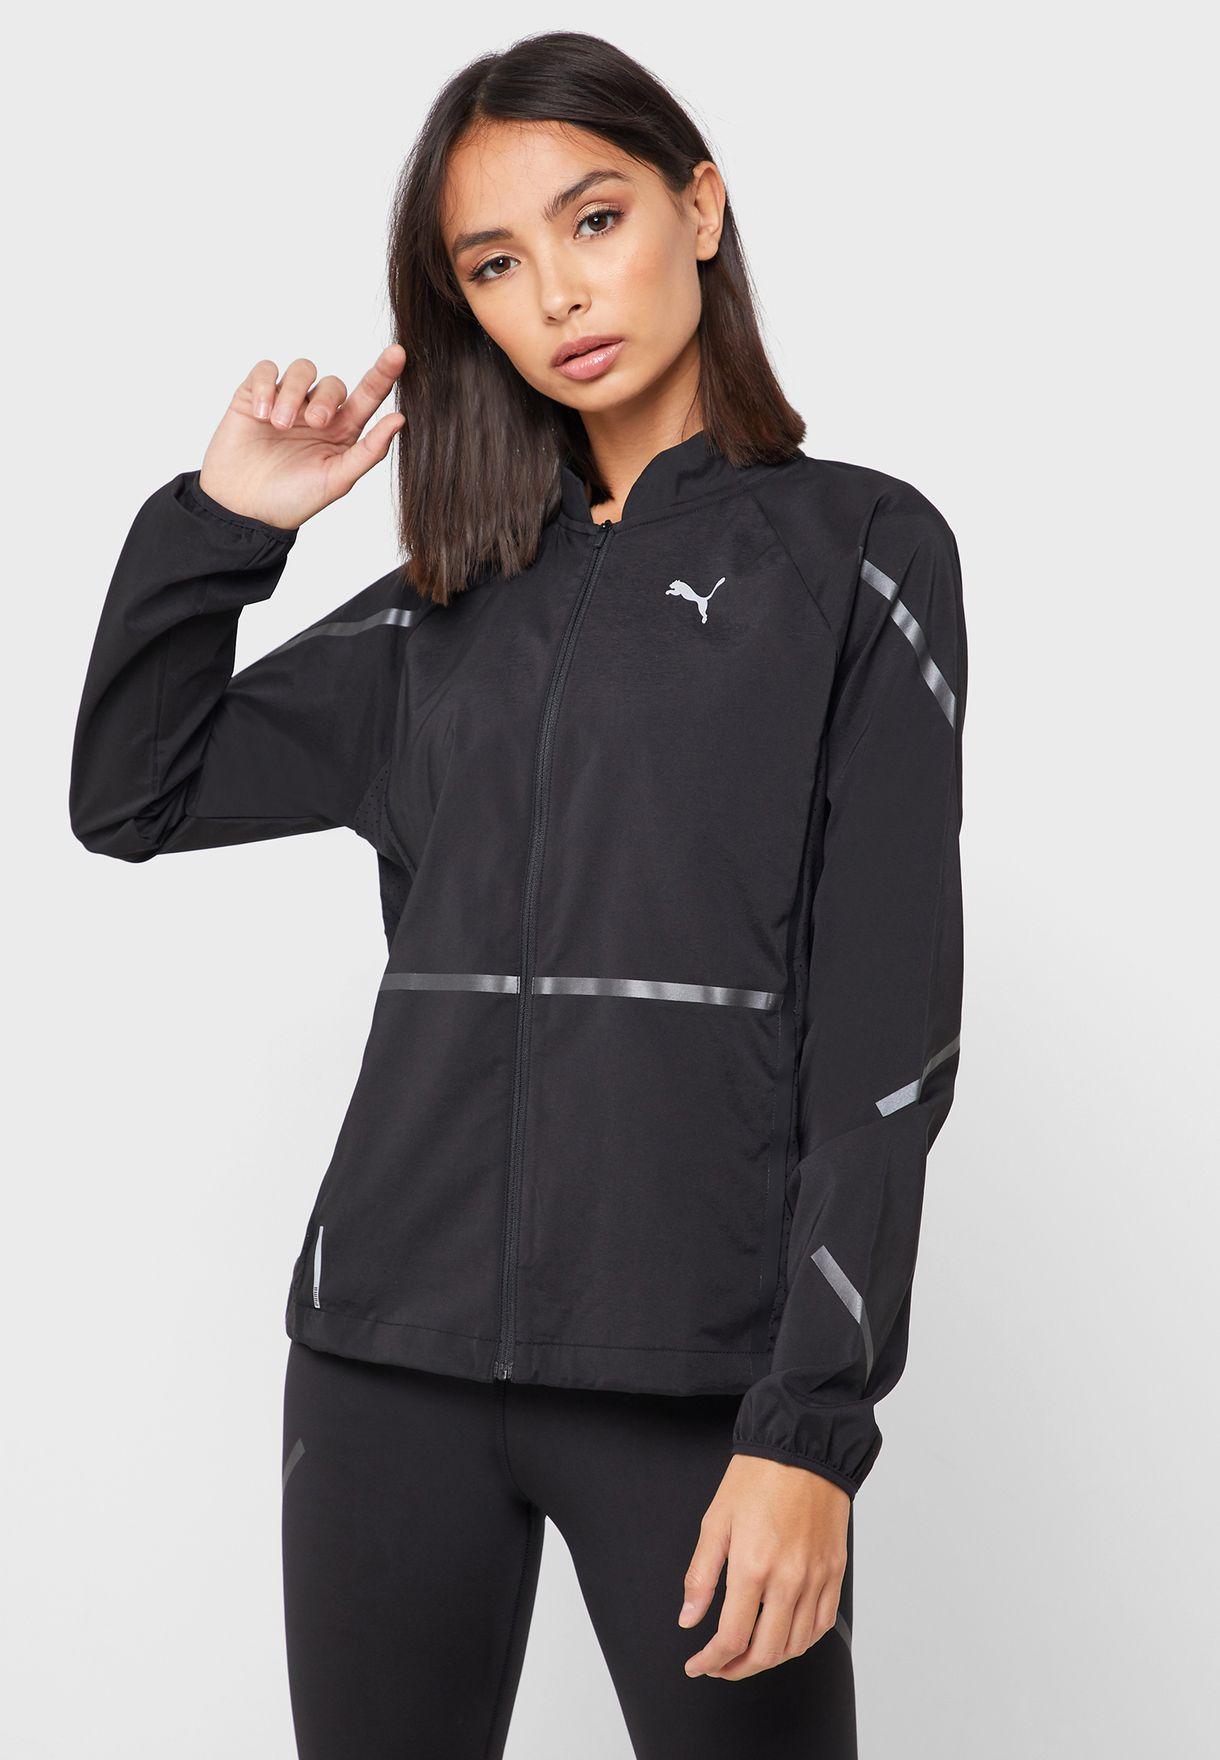 Runner ID Jacket